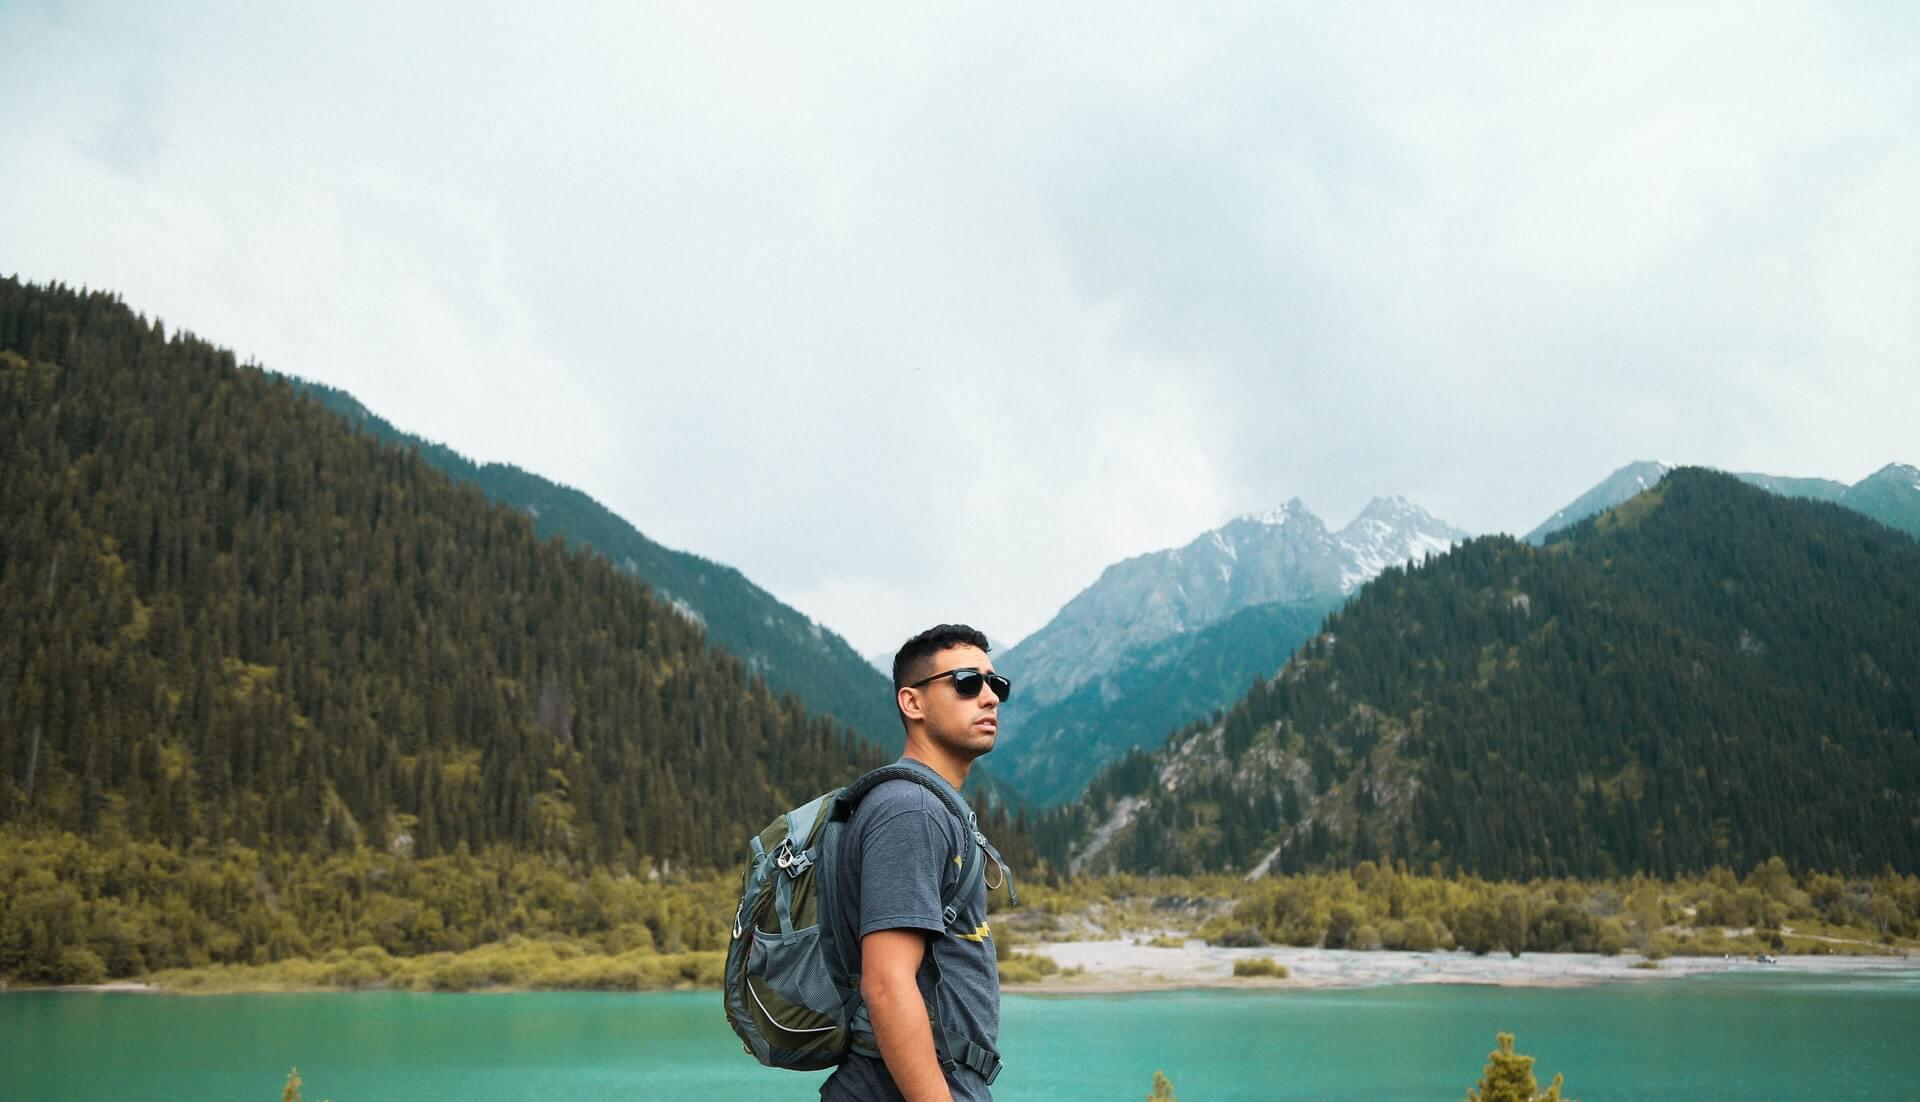 «Very nice!»: как Казахстан развивает туризм, и при чём тут Борат